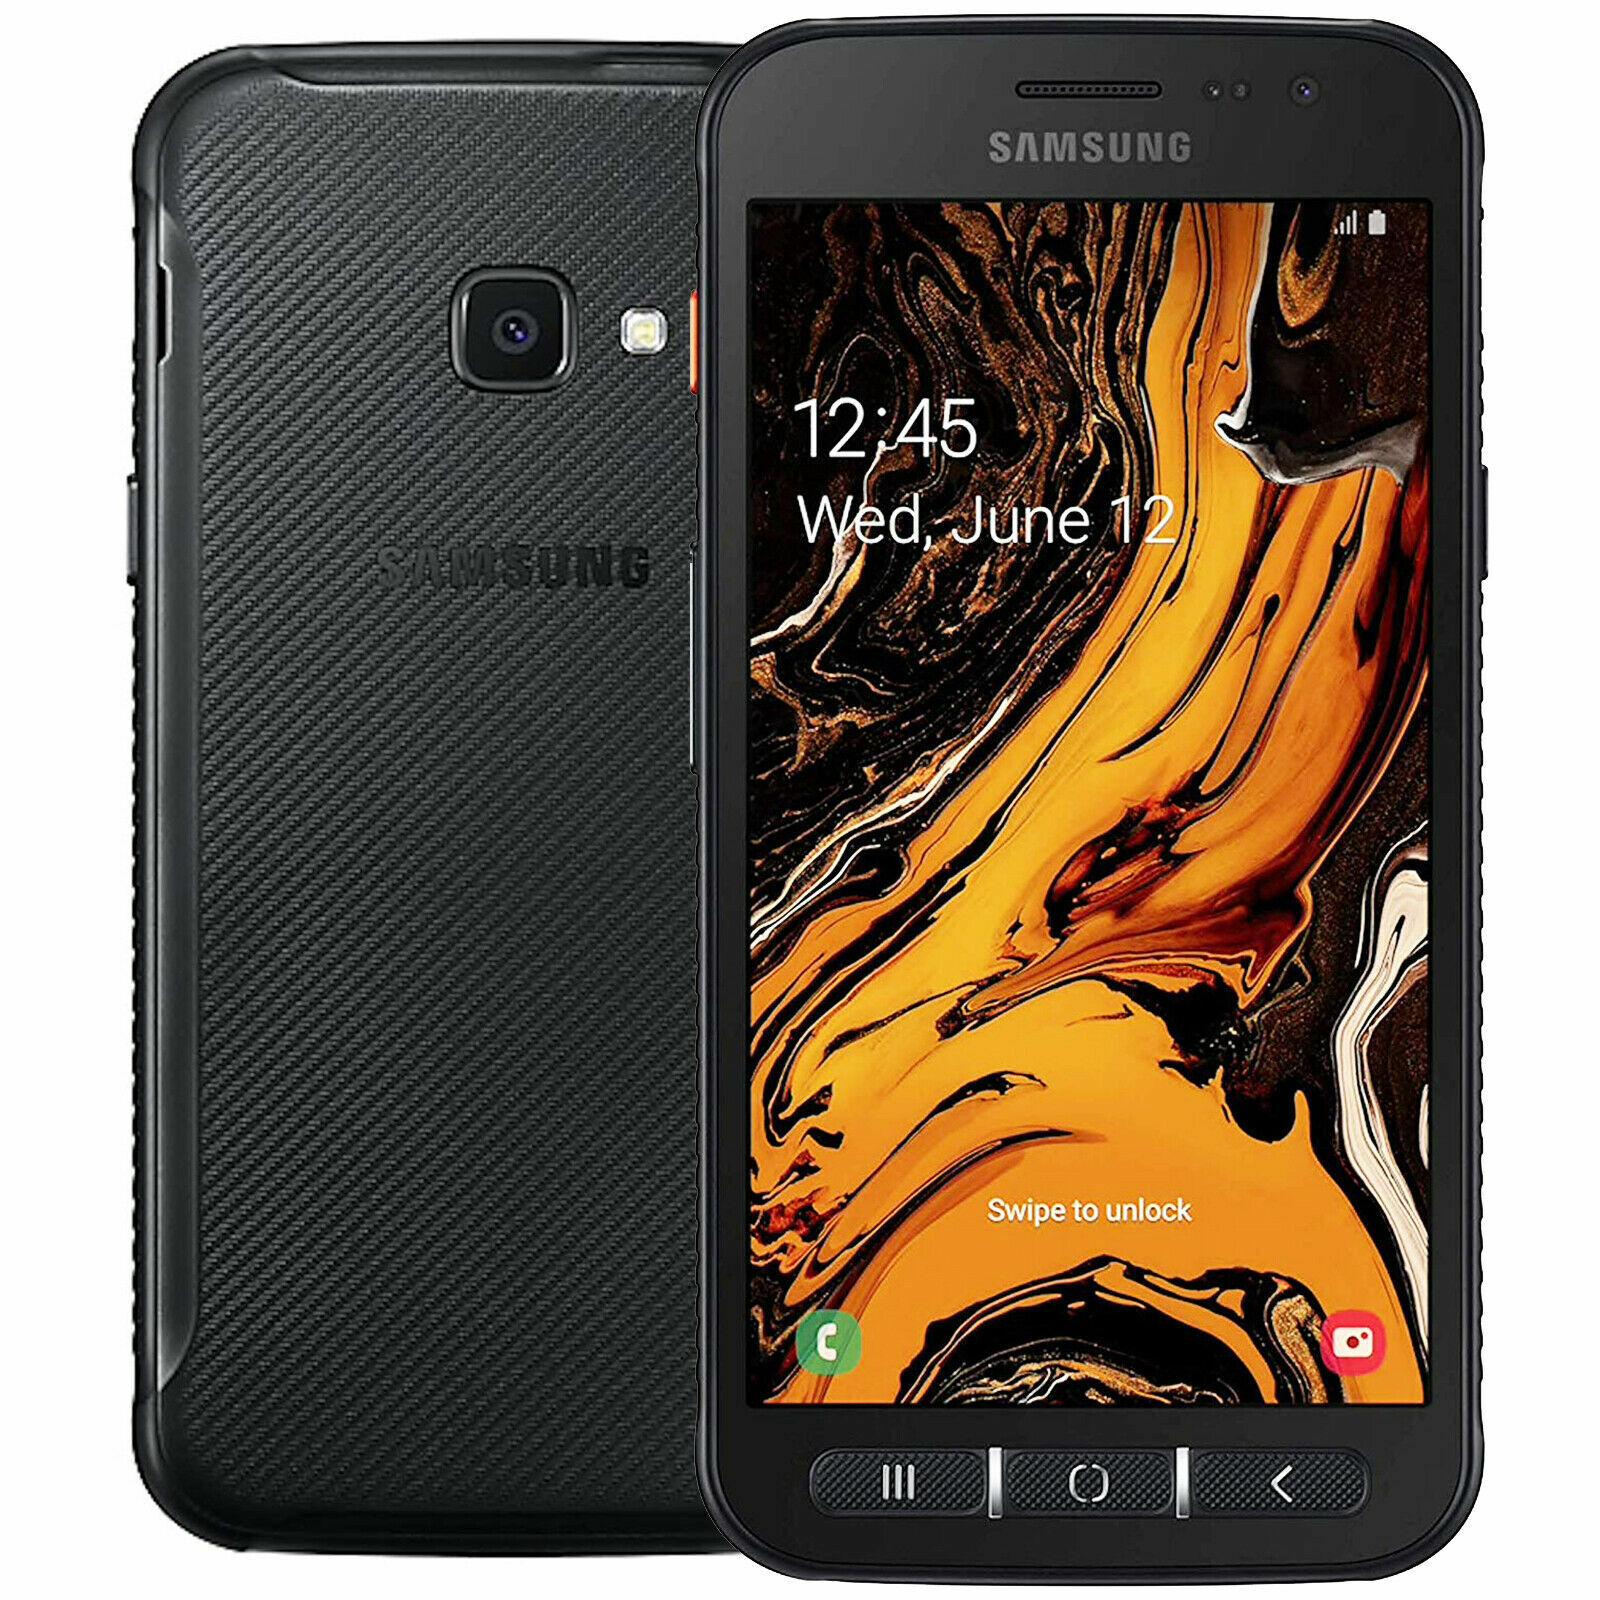 Samsung GALAXY XCover 4s G398F 32GB Dual Sim Android Smartphone Handy Schwarz